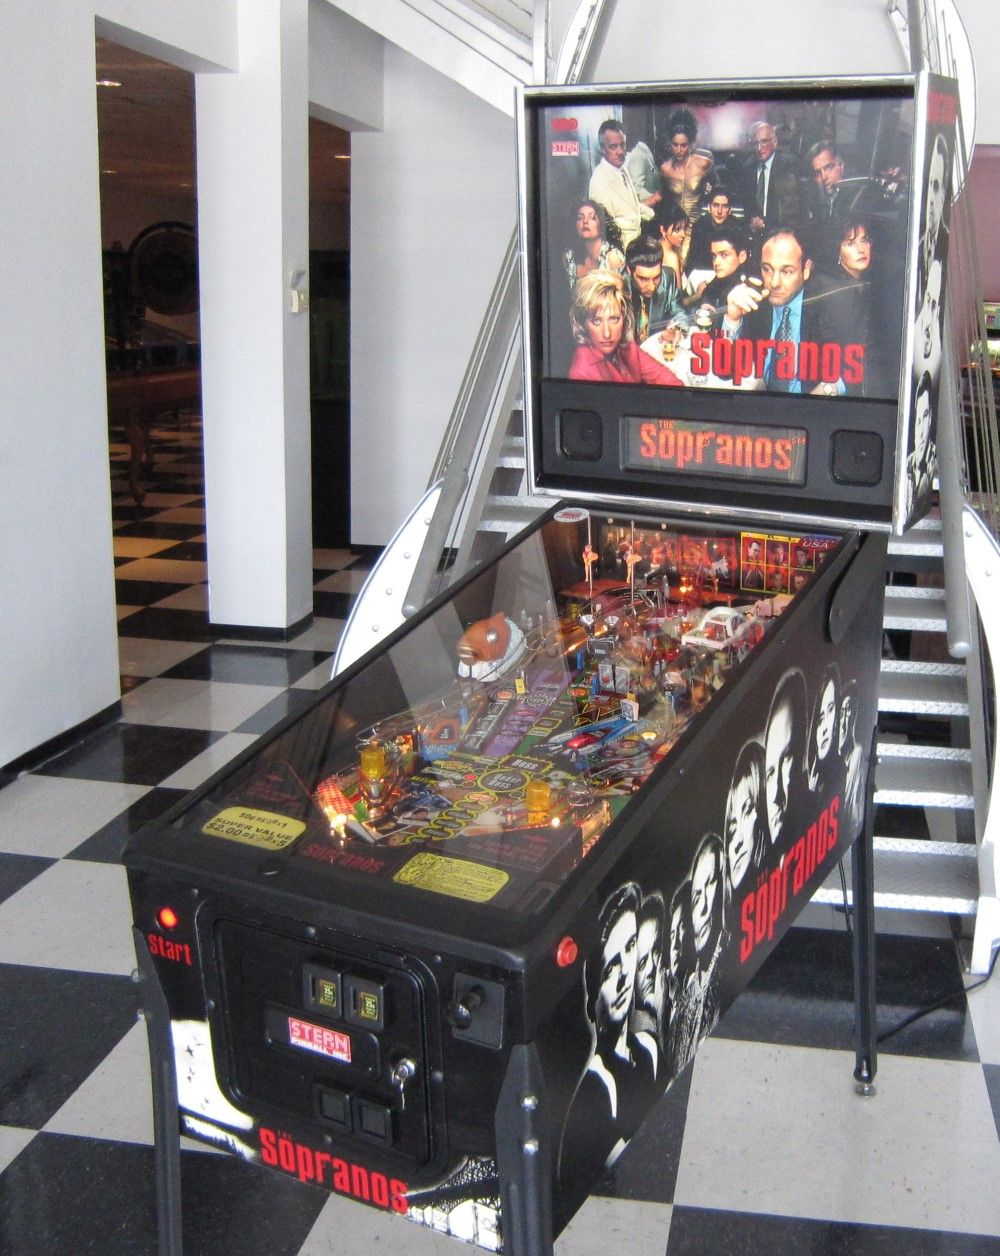 The Sopranos Pinball, Pinball machine, Gaming products